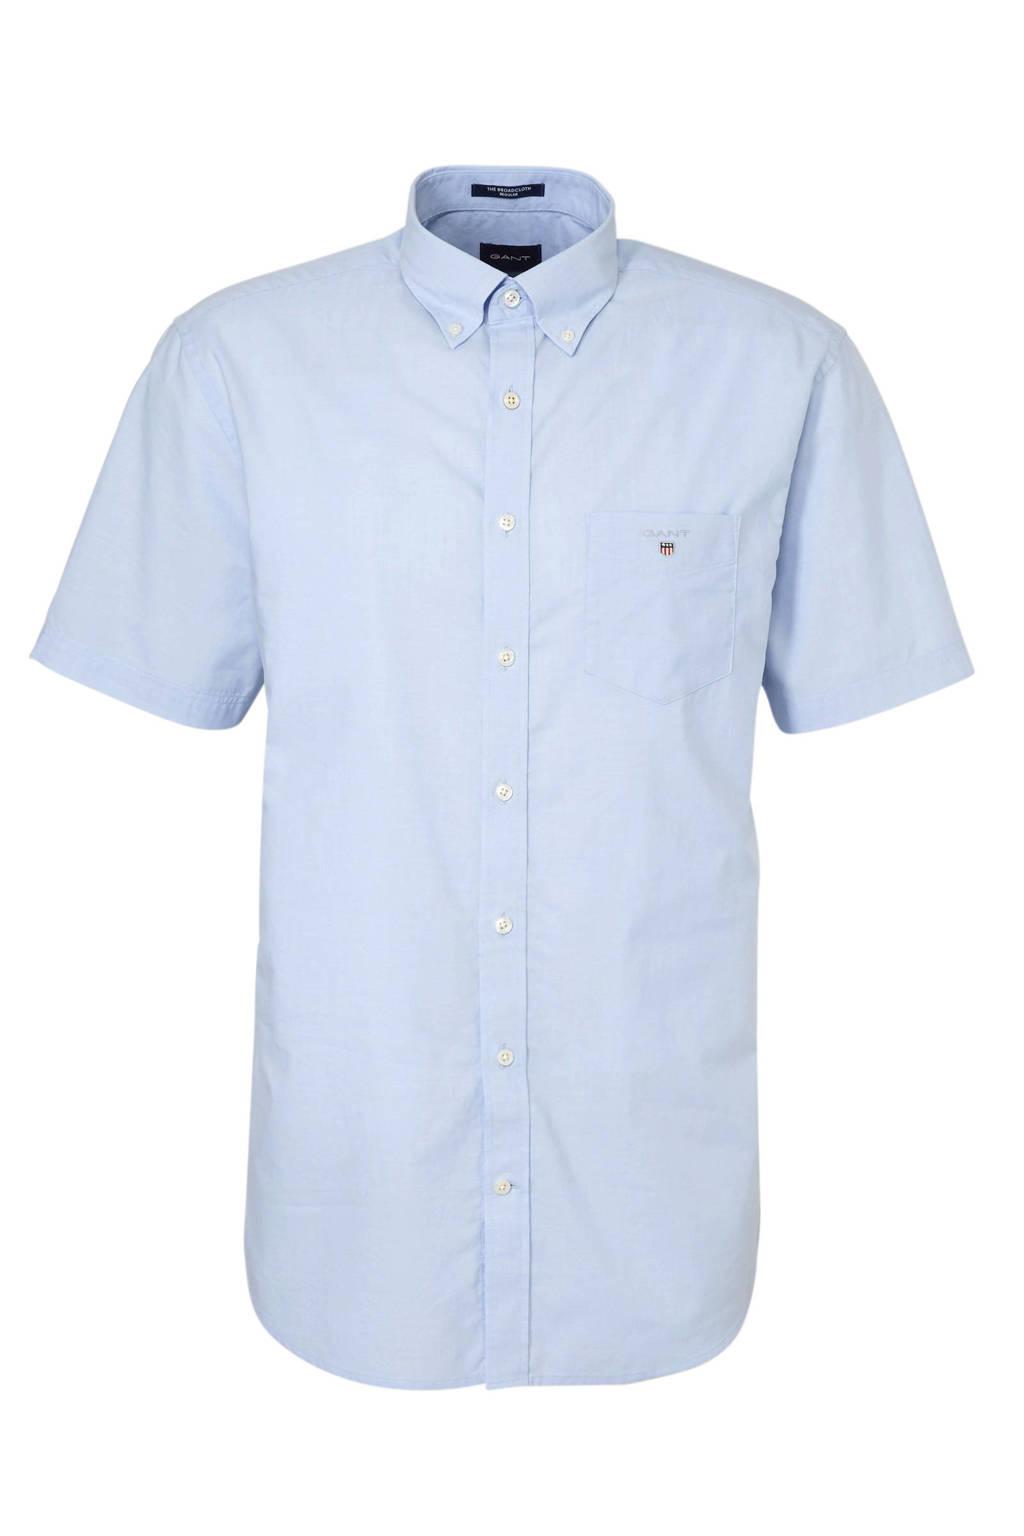 GANT regular fit overhemd blauw, Blauw